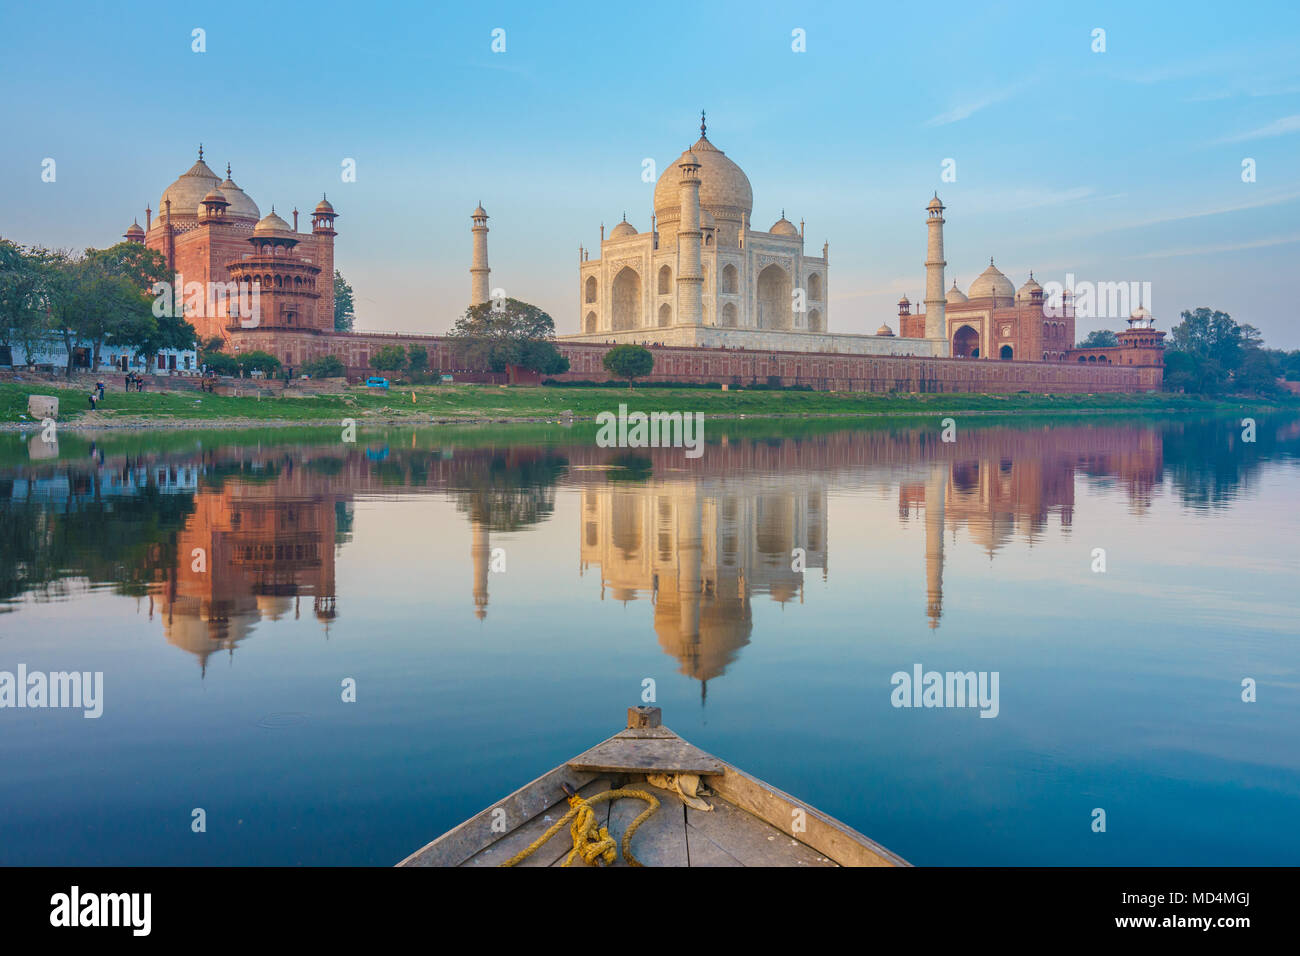 Bootsfahrt auf dem Yamuna-Fluss in der Nähe von Taj Mahal Stockbild